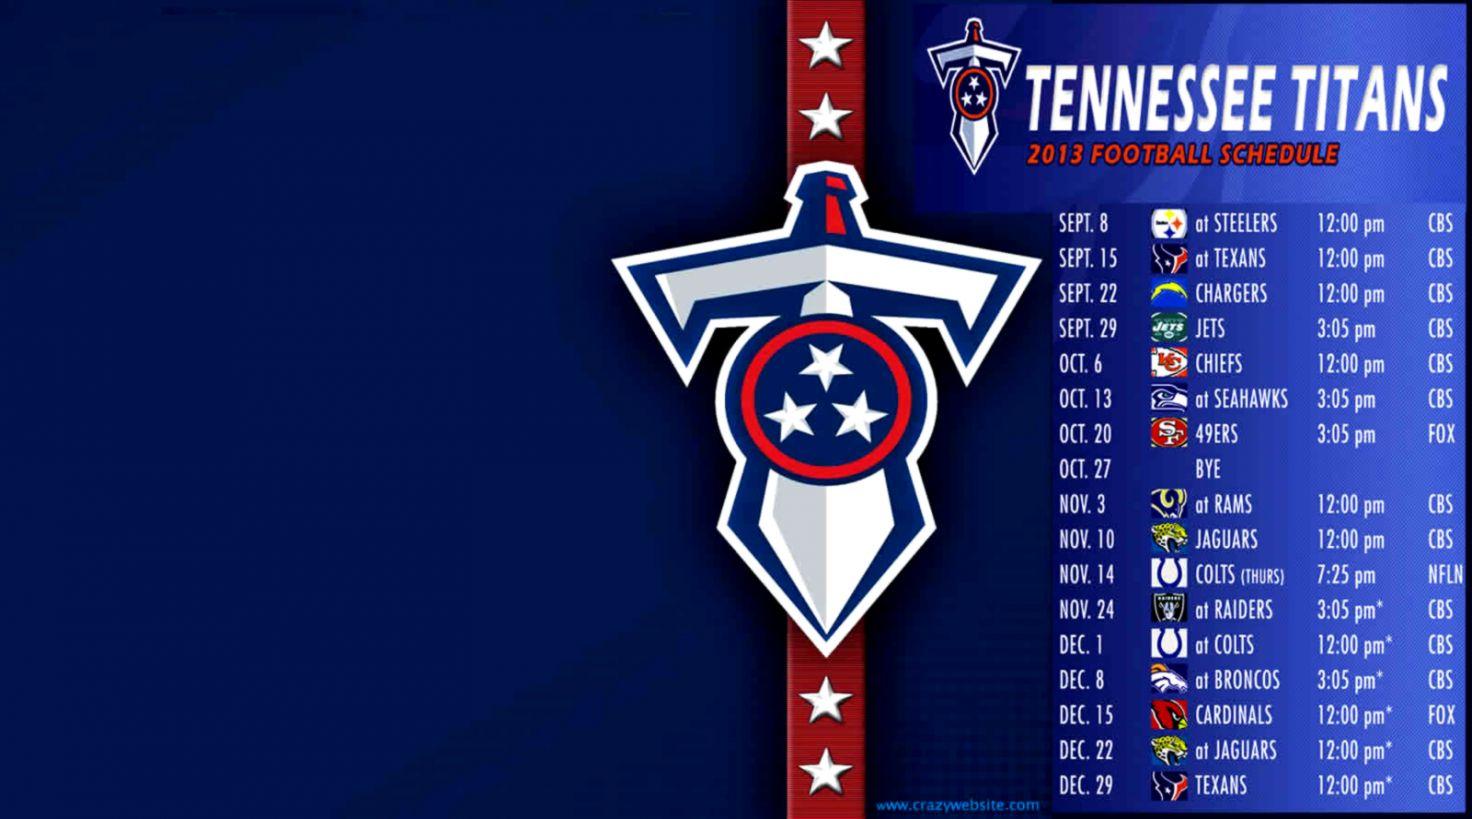 3523a6c8 Tennessee Titans Nfl Schedule Season Wallpaper | Wallpapers Art